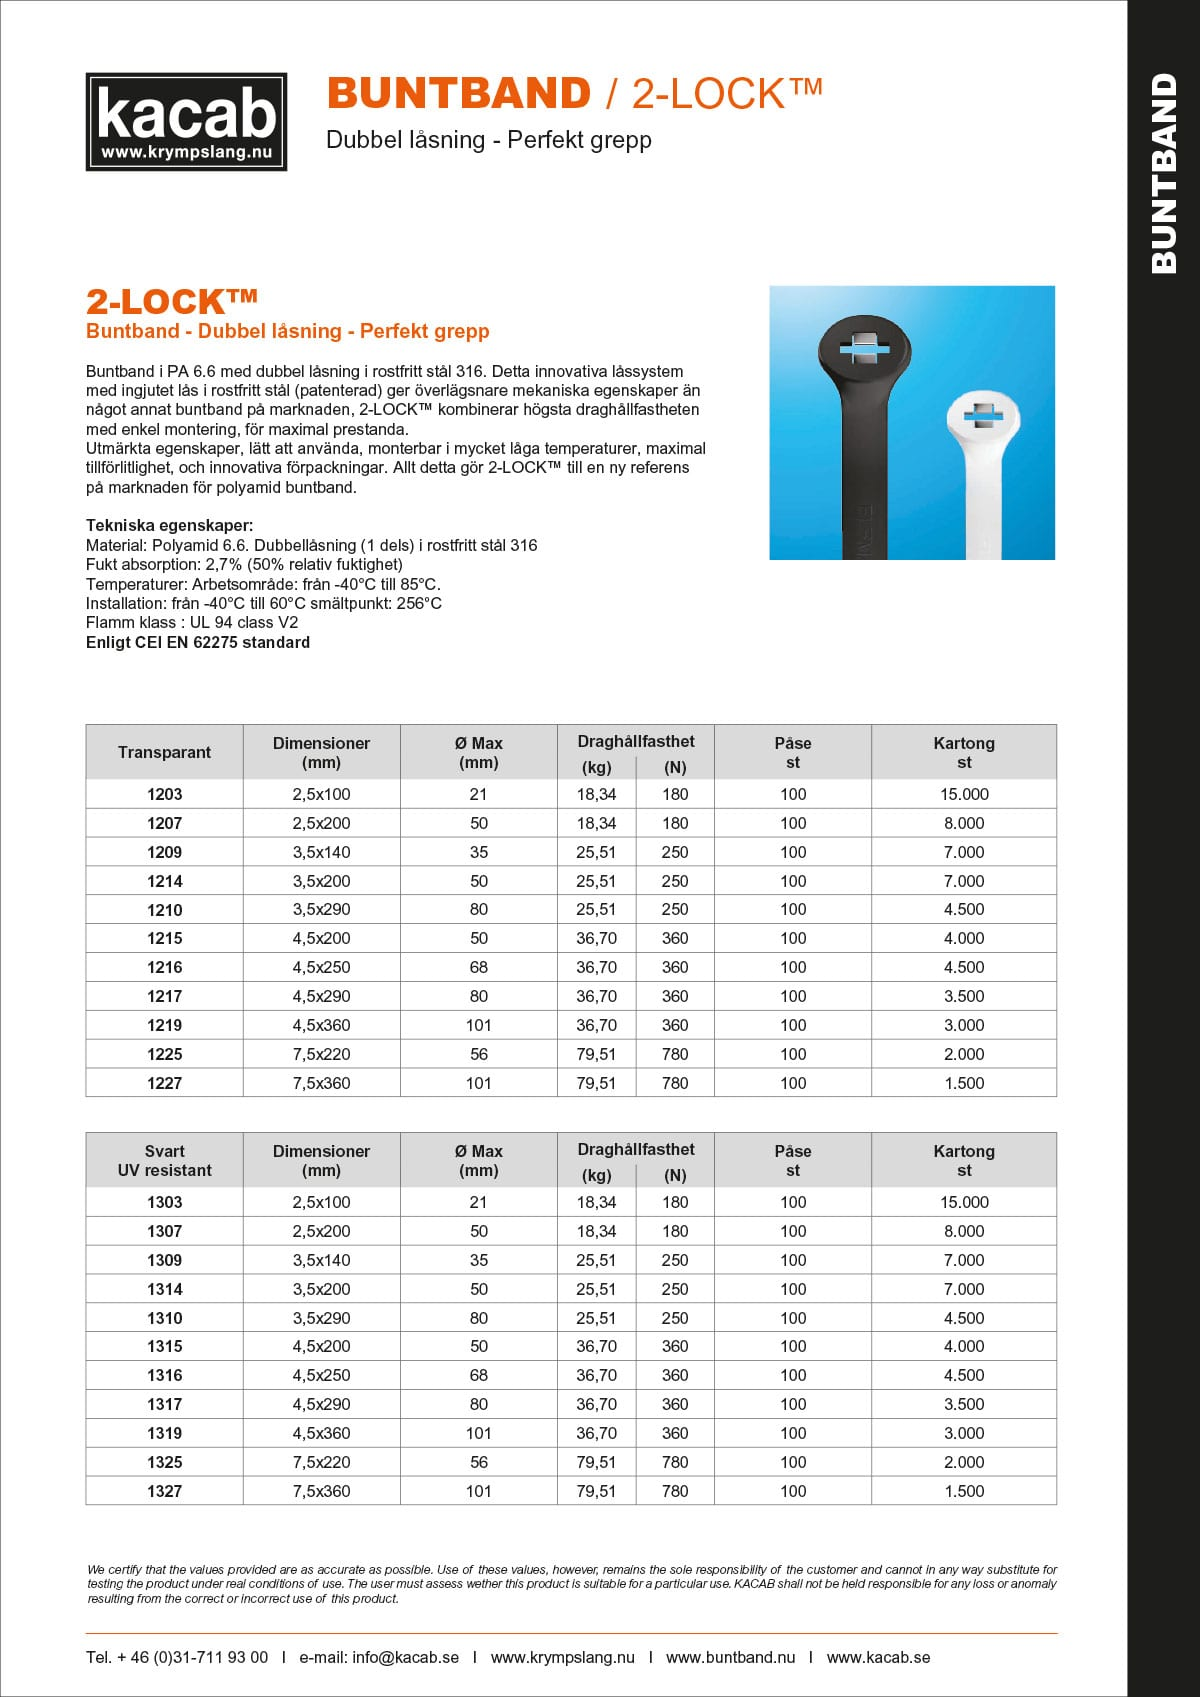 2-Lock Buntband